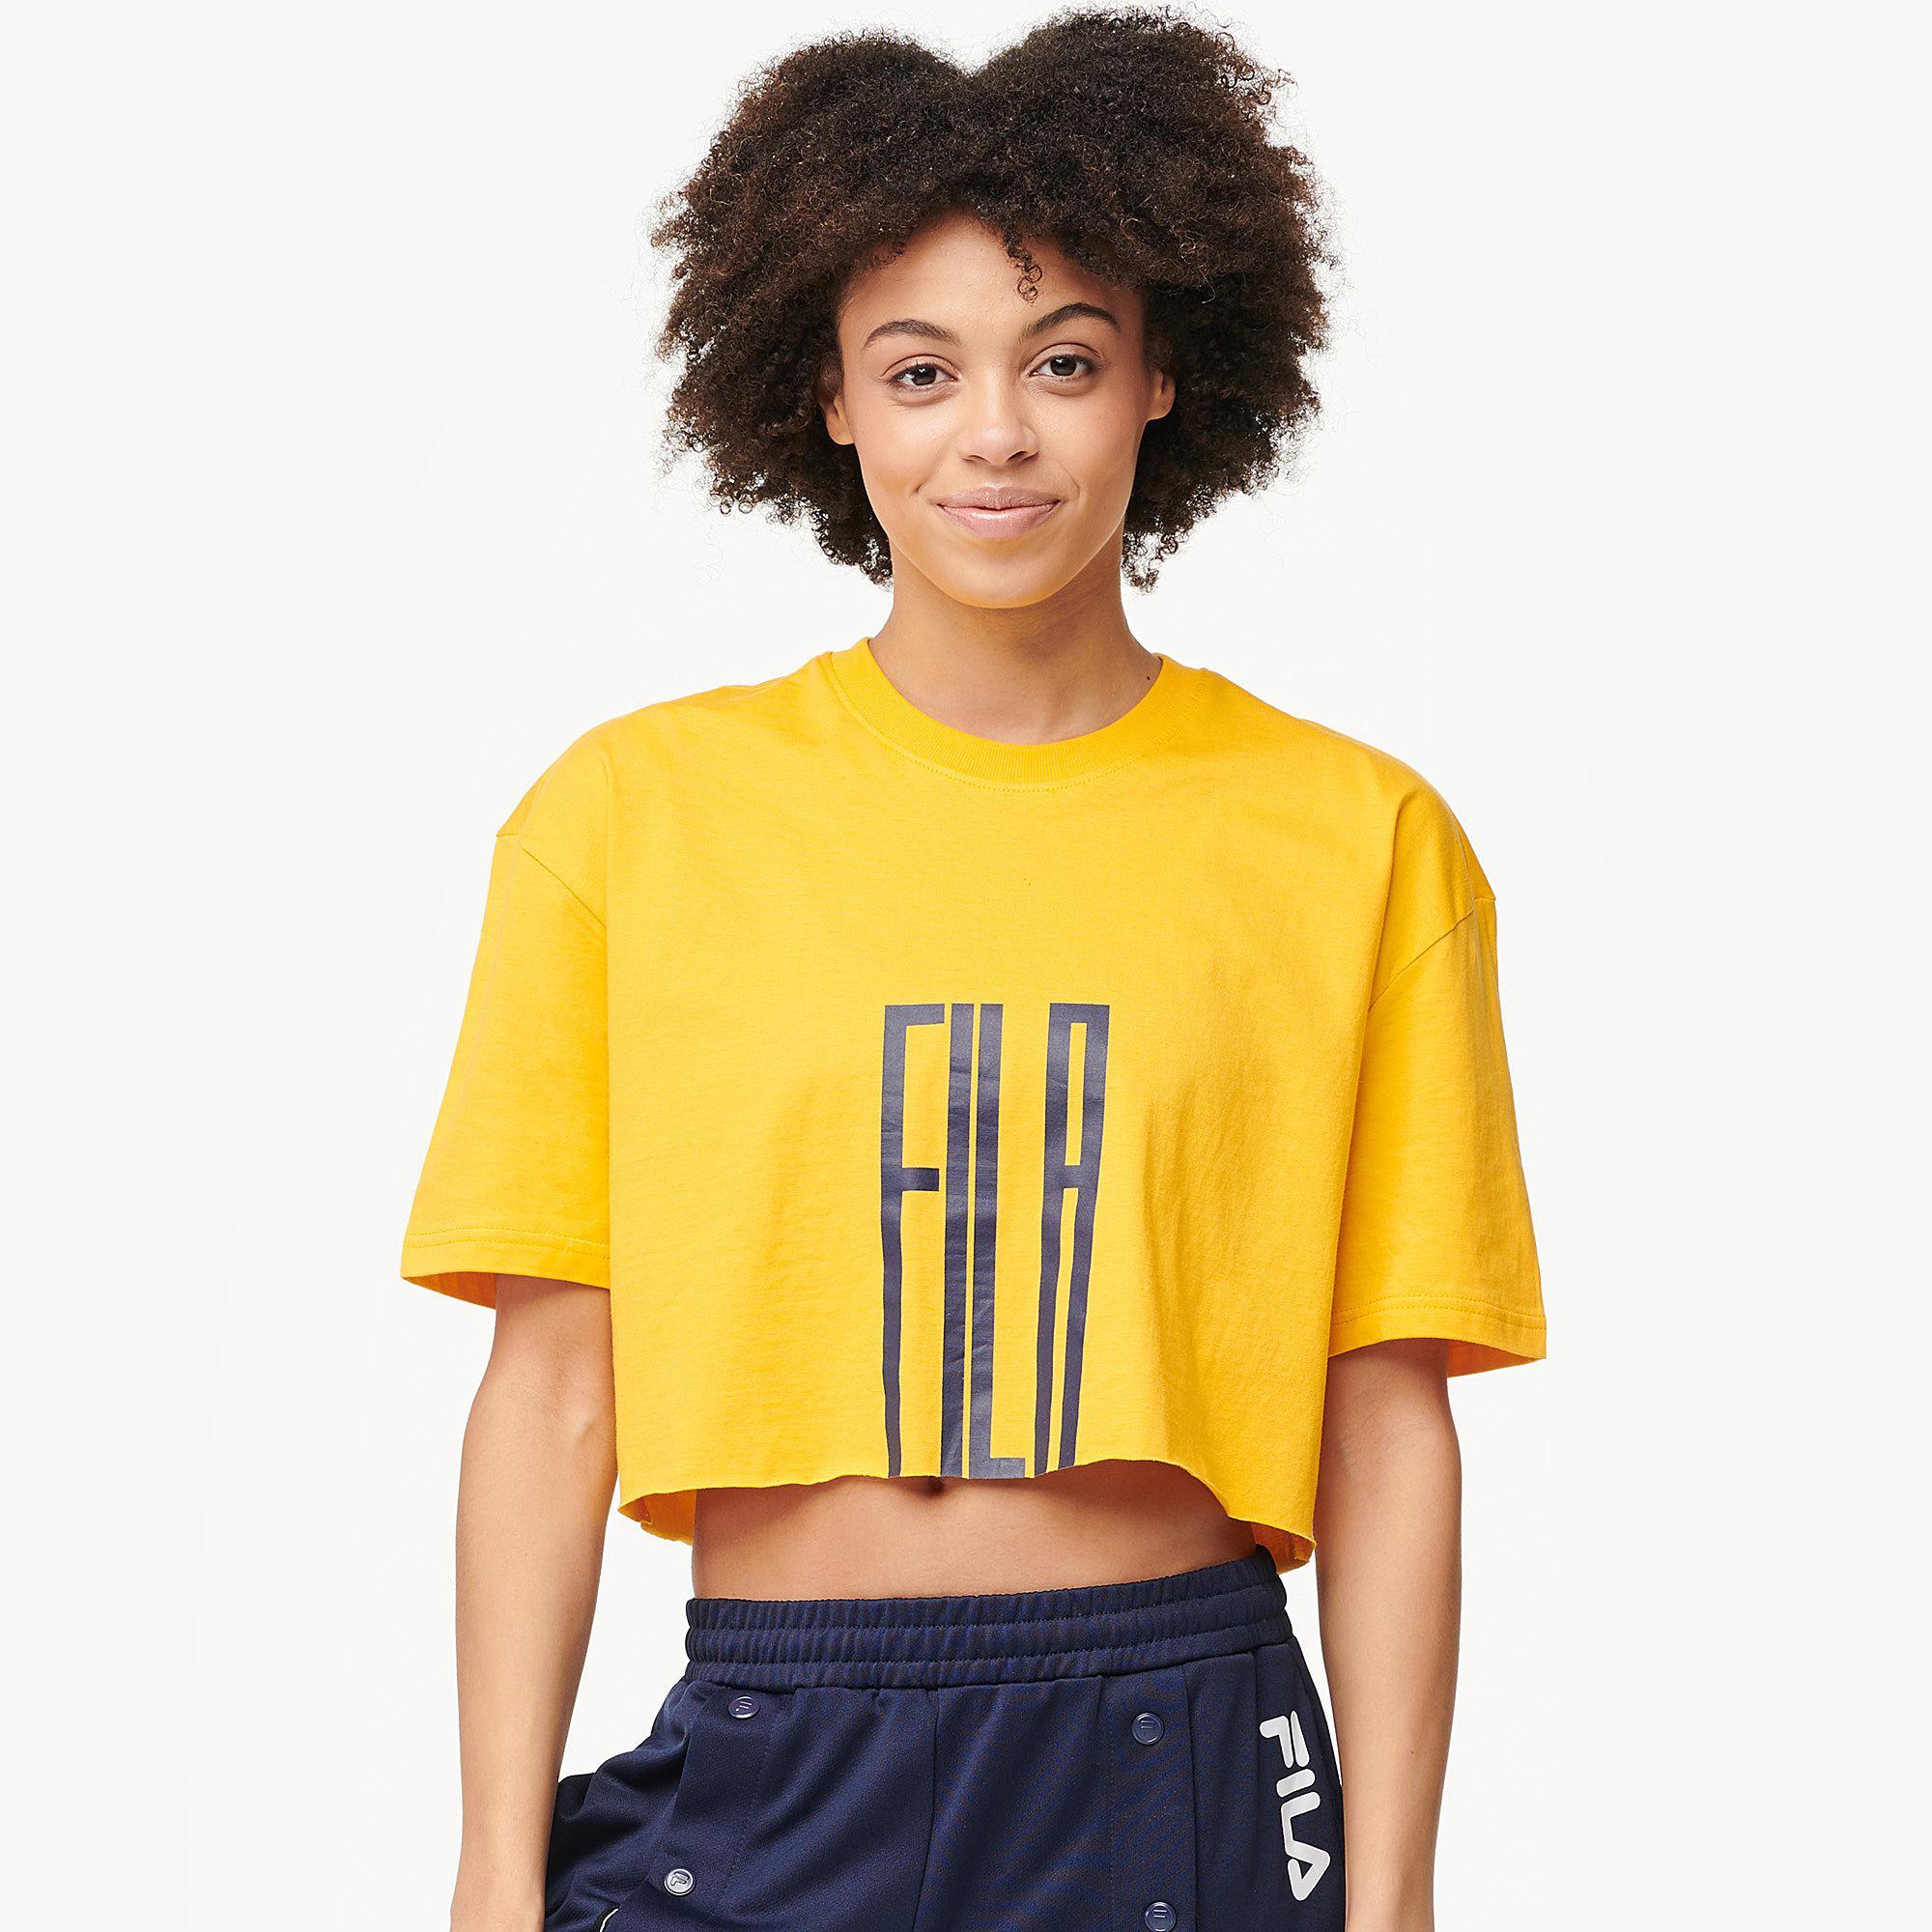 55c909f56 Lyst - Fila Domenica Yellow Crop T-shirt - Womens Xs in Yellow